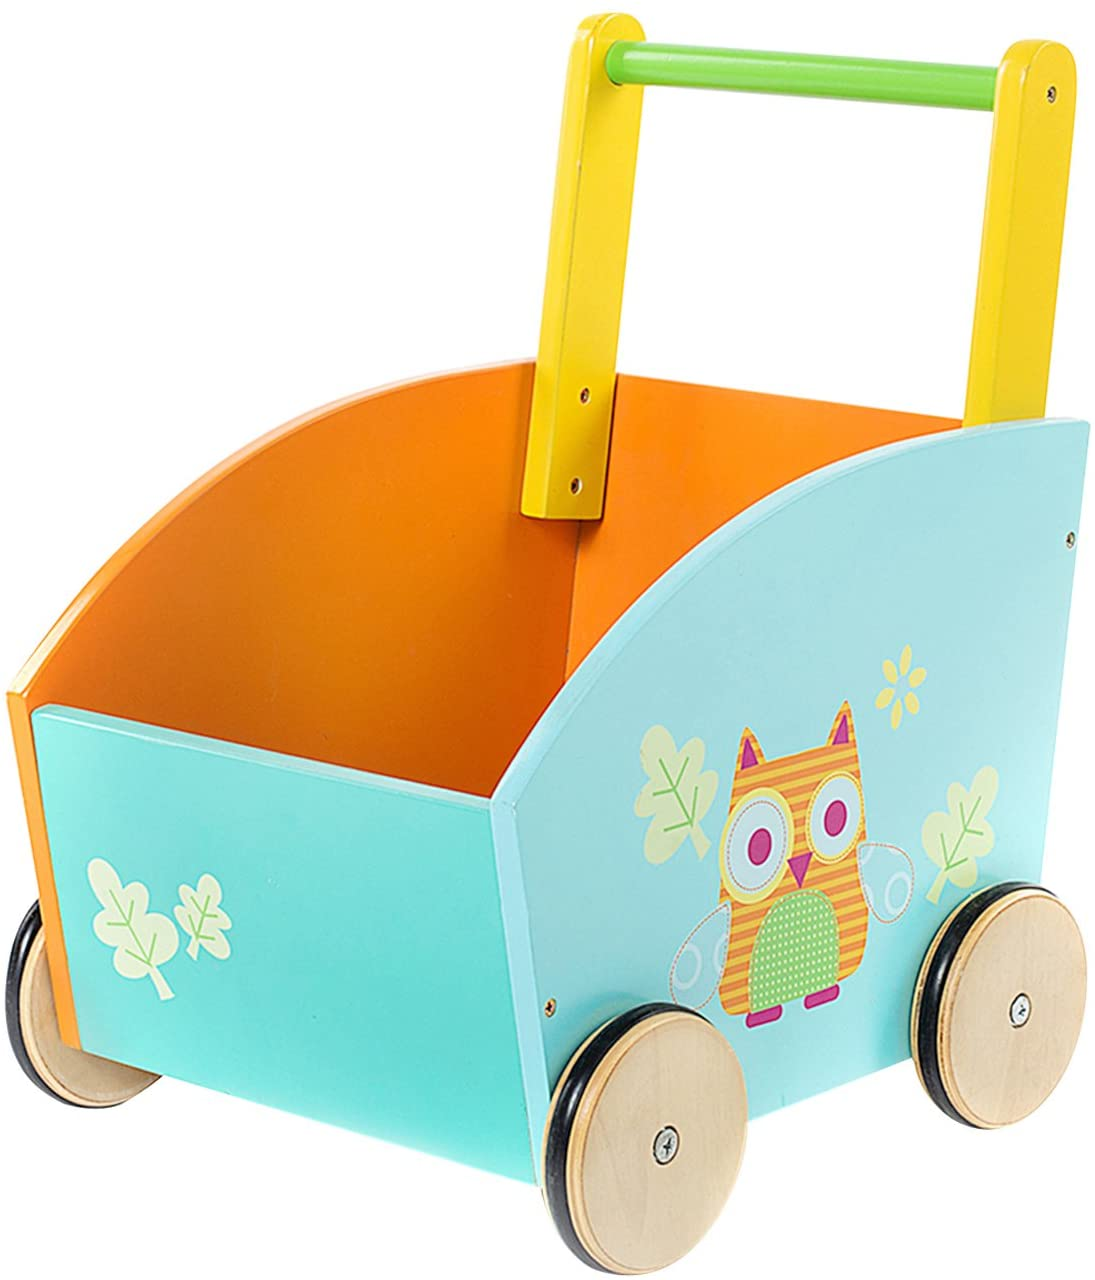 carrito infantil montessori para niños de 1 año